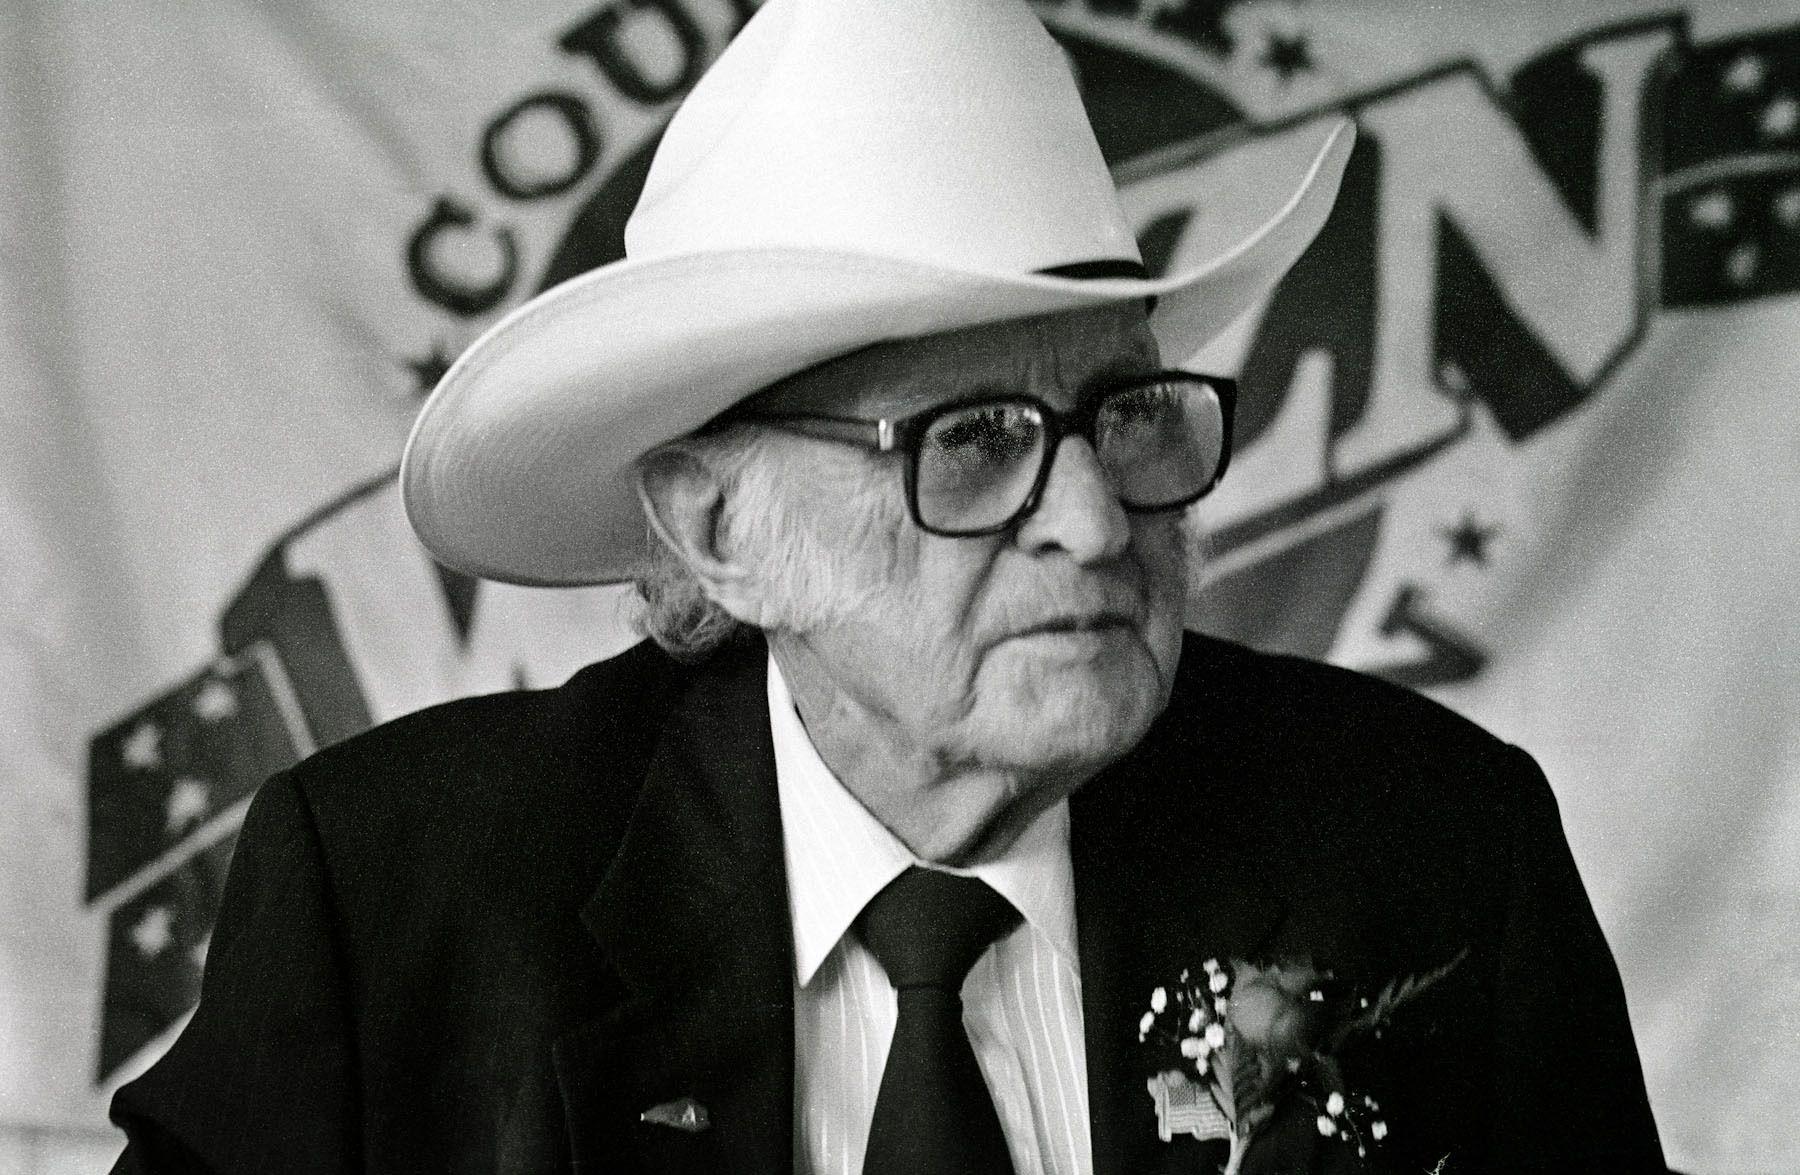 Bill Monroe 07/15/91